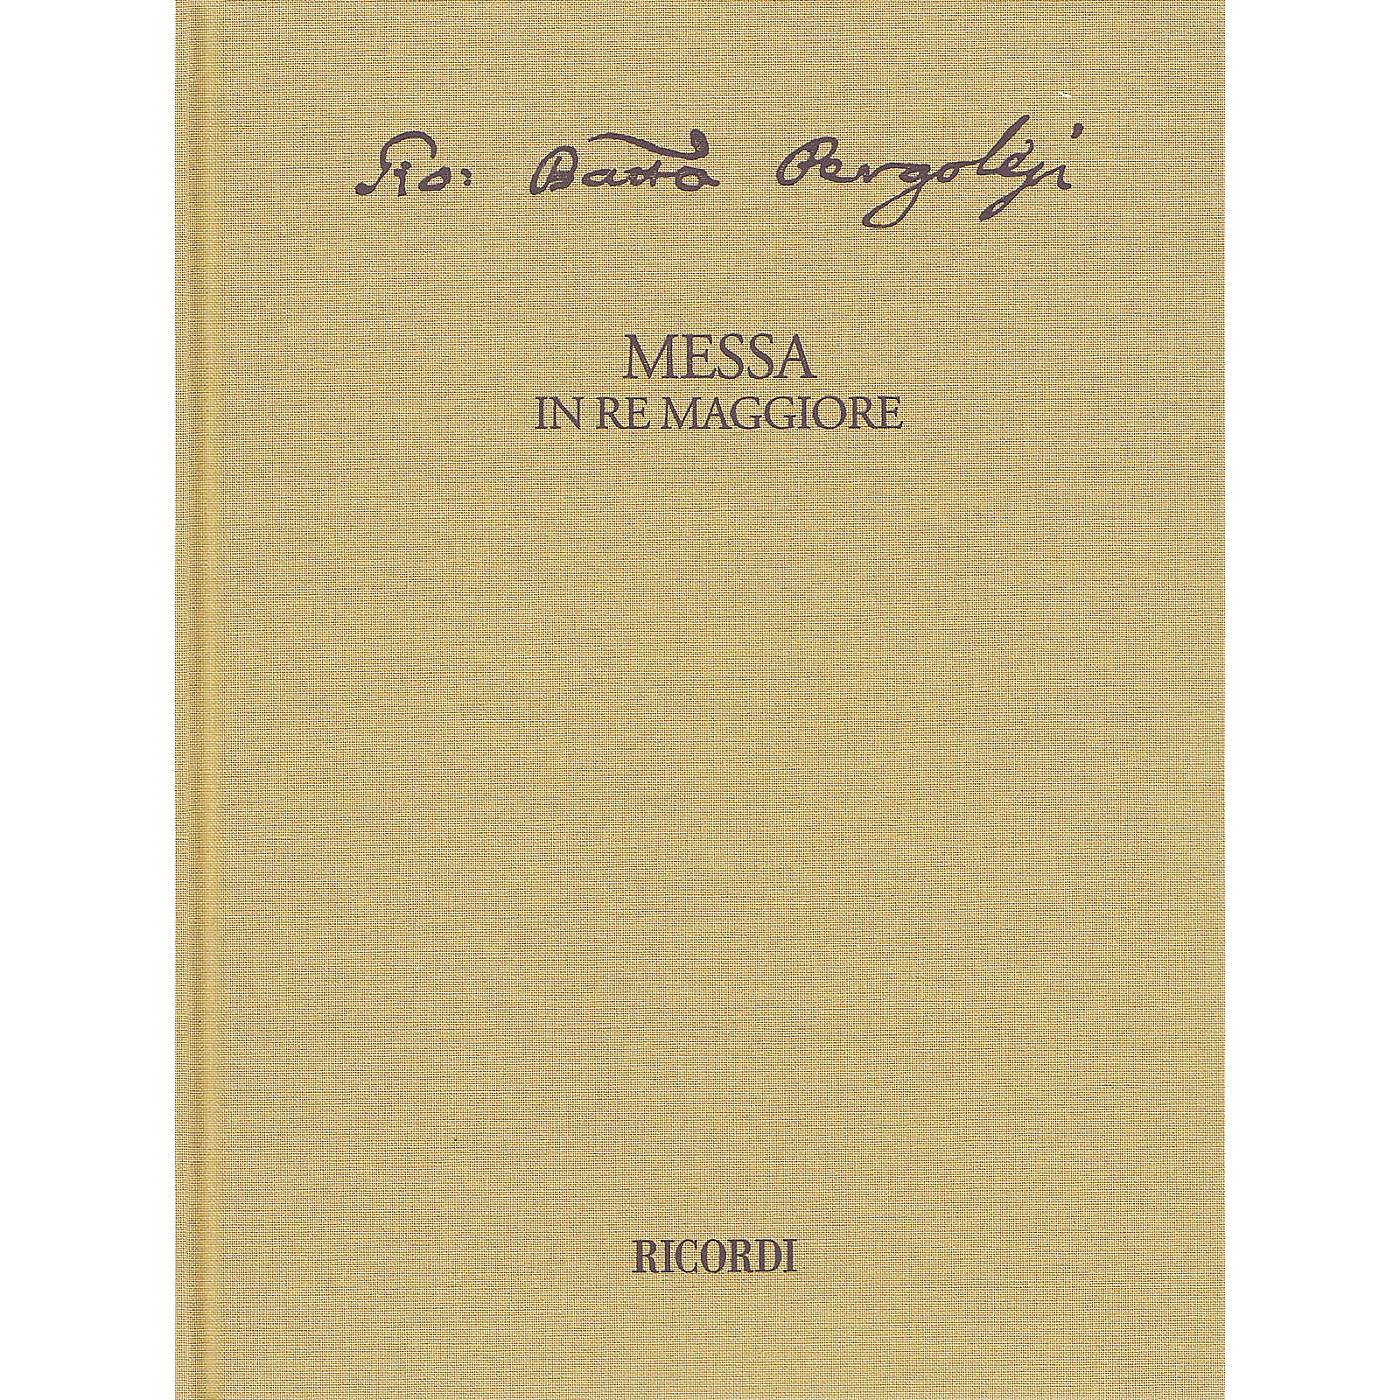 Ricordi Messa in re maggiore Critical Edition Full Score, Hardbound with Commentary Hardcover by Pergolesi thumbnail